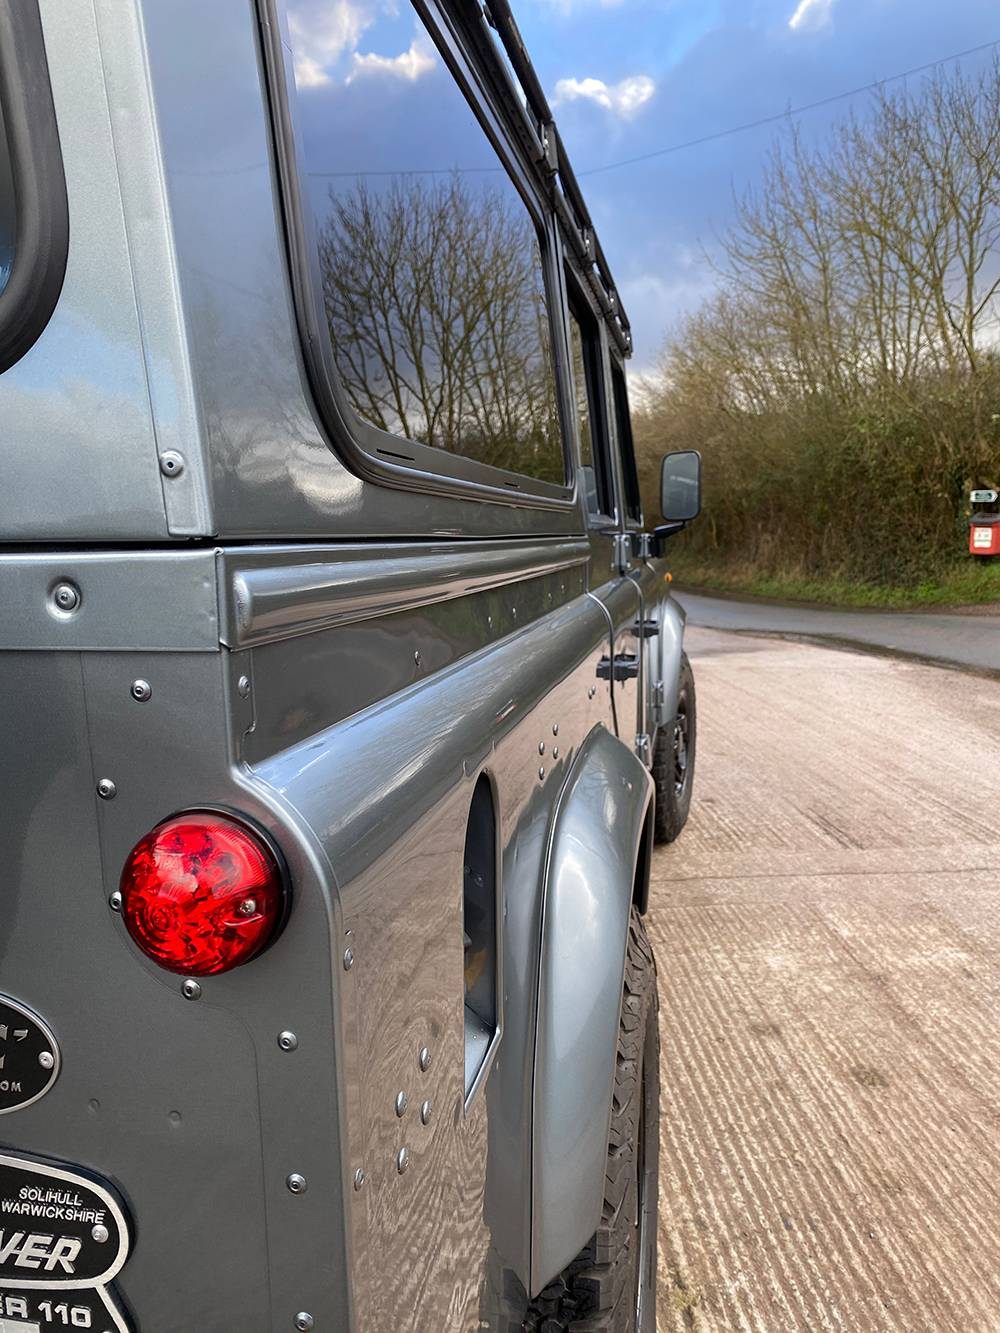 Land Rover D110 Metallic Grey 8536